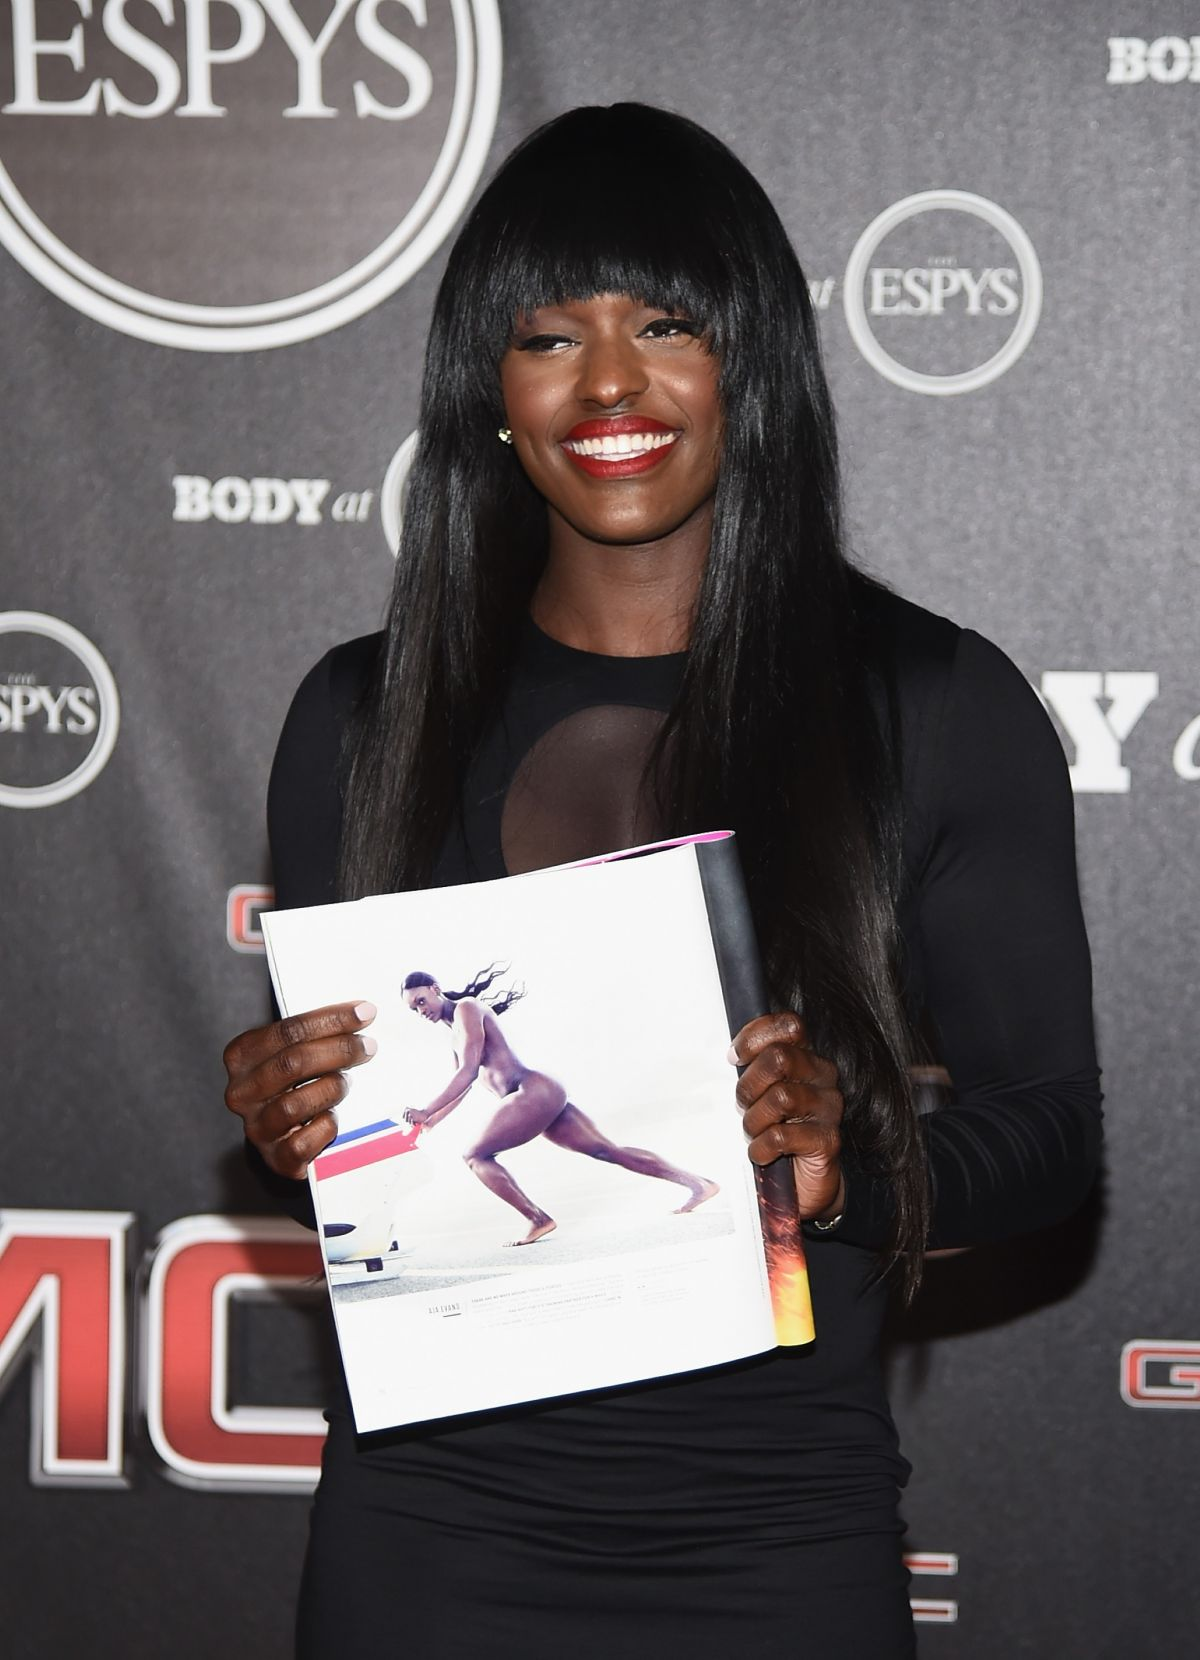 AJA EVANS at ESPN Presents Body at ESPYS